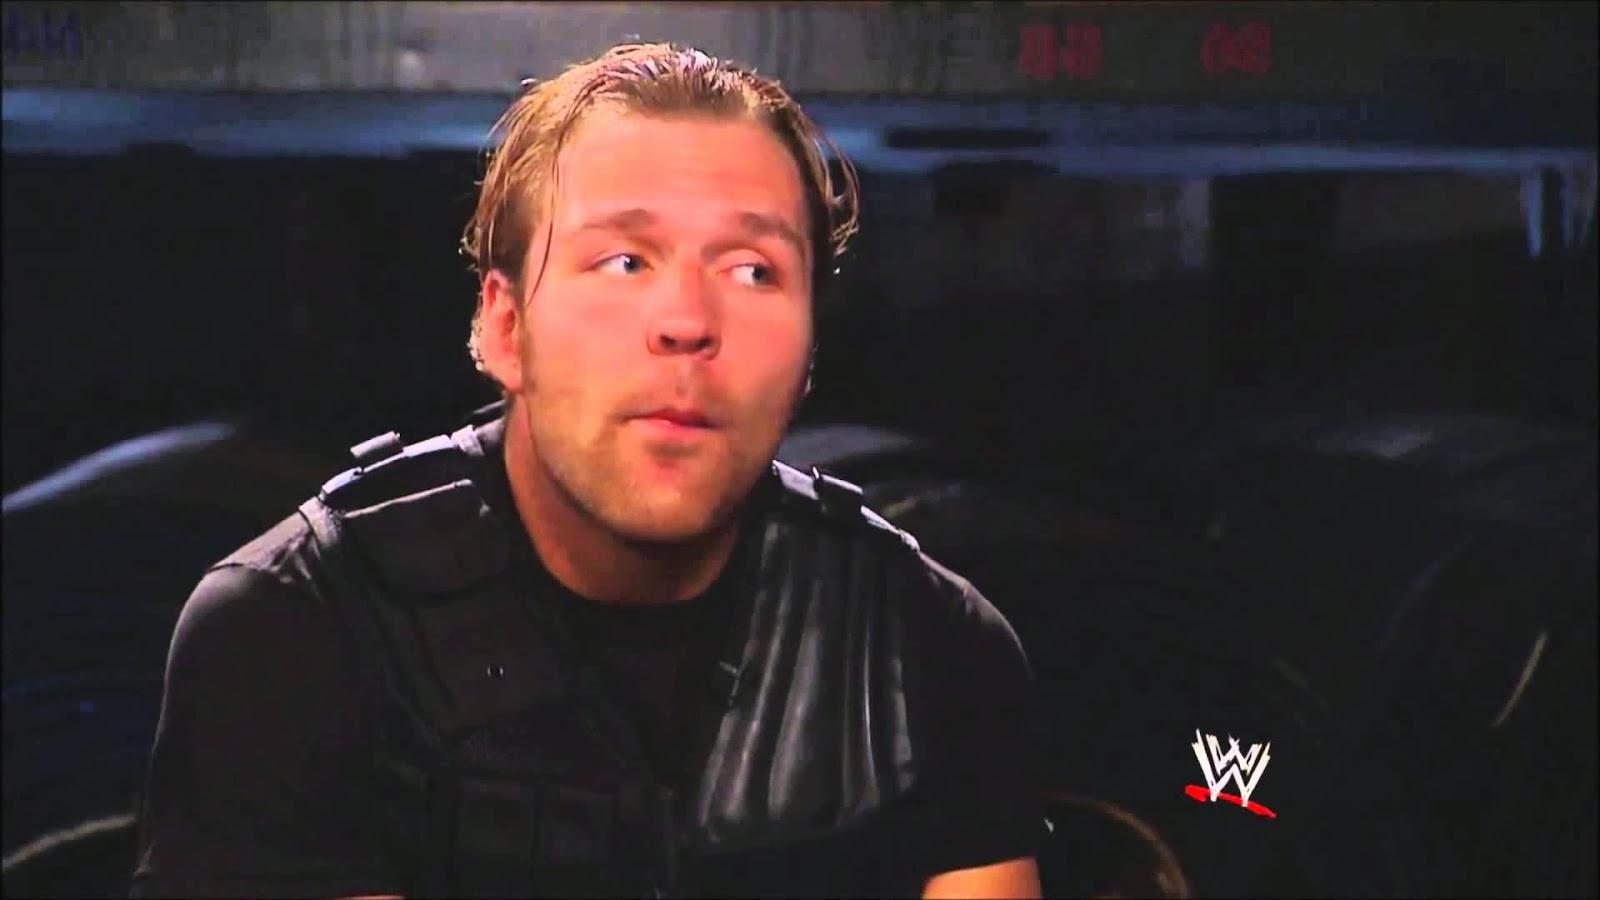 Dean Ambrose Hd Wallpapers Download WWE HD WALLPAPER FREE 1600x900